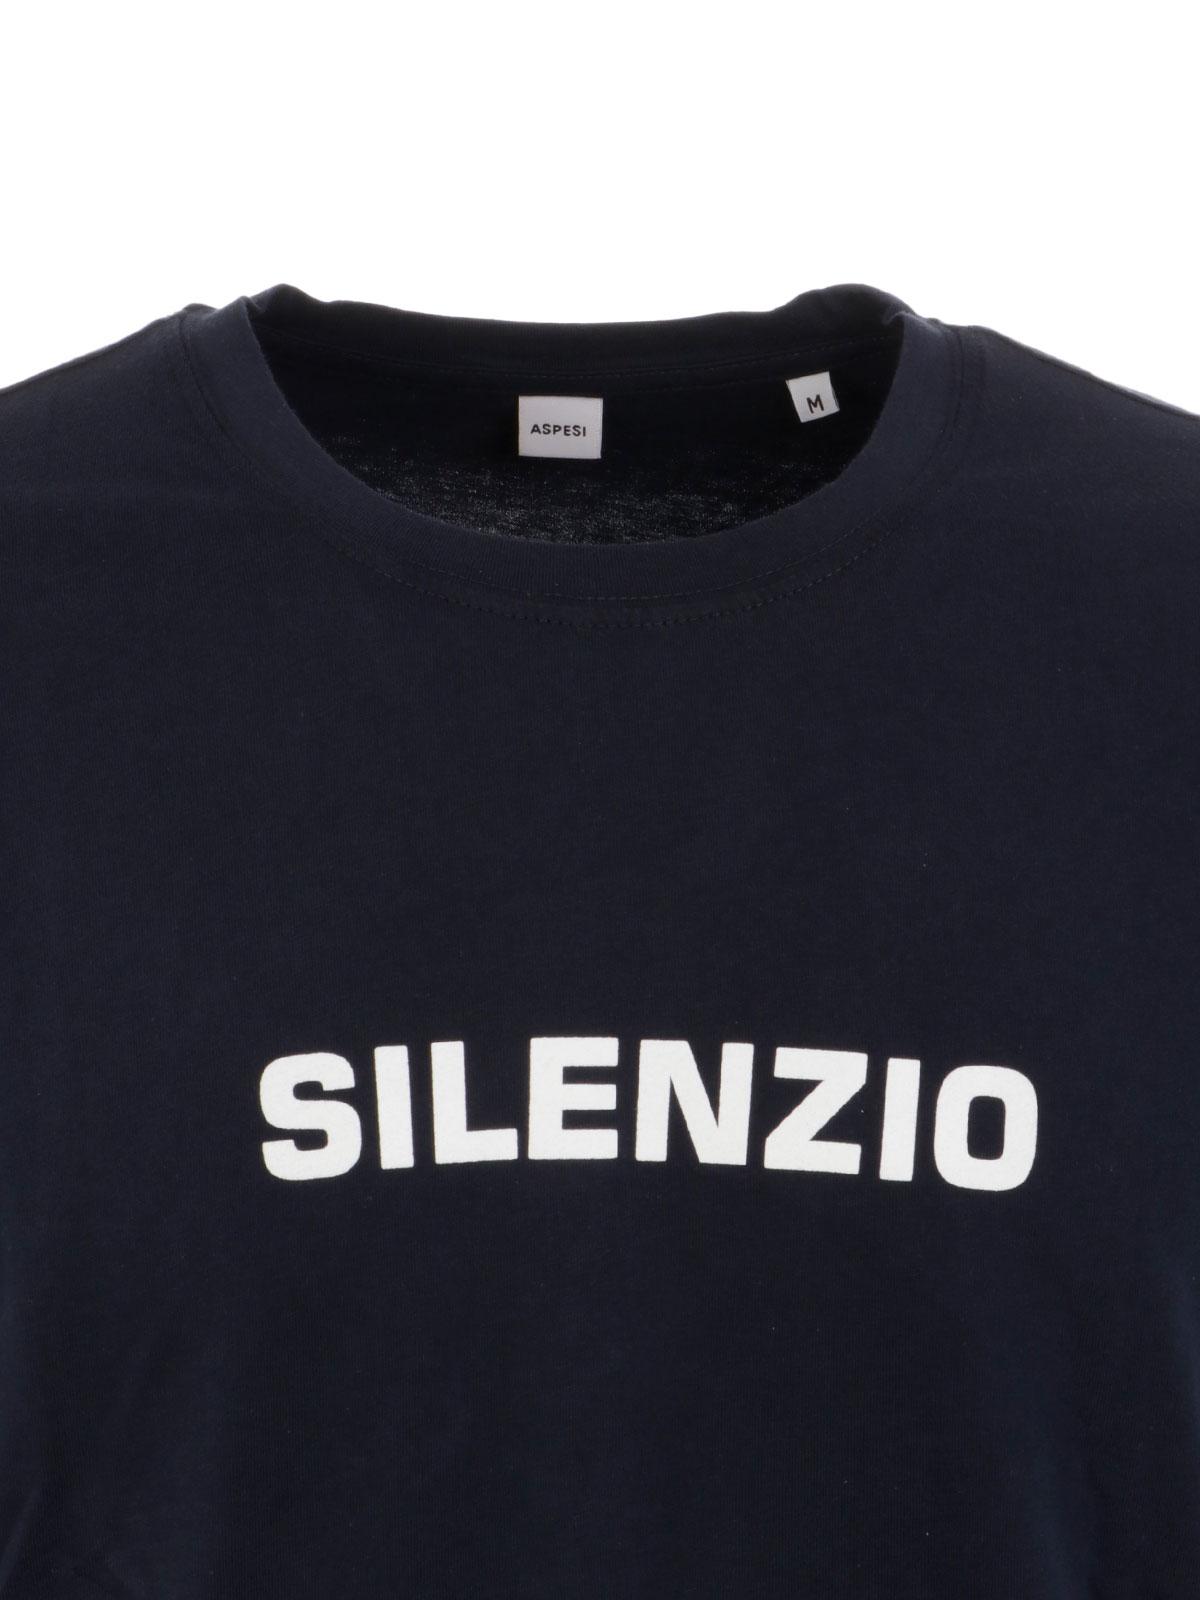 Picture of ASPESI   Men's T-shirt